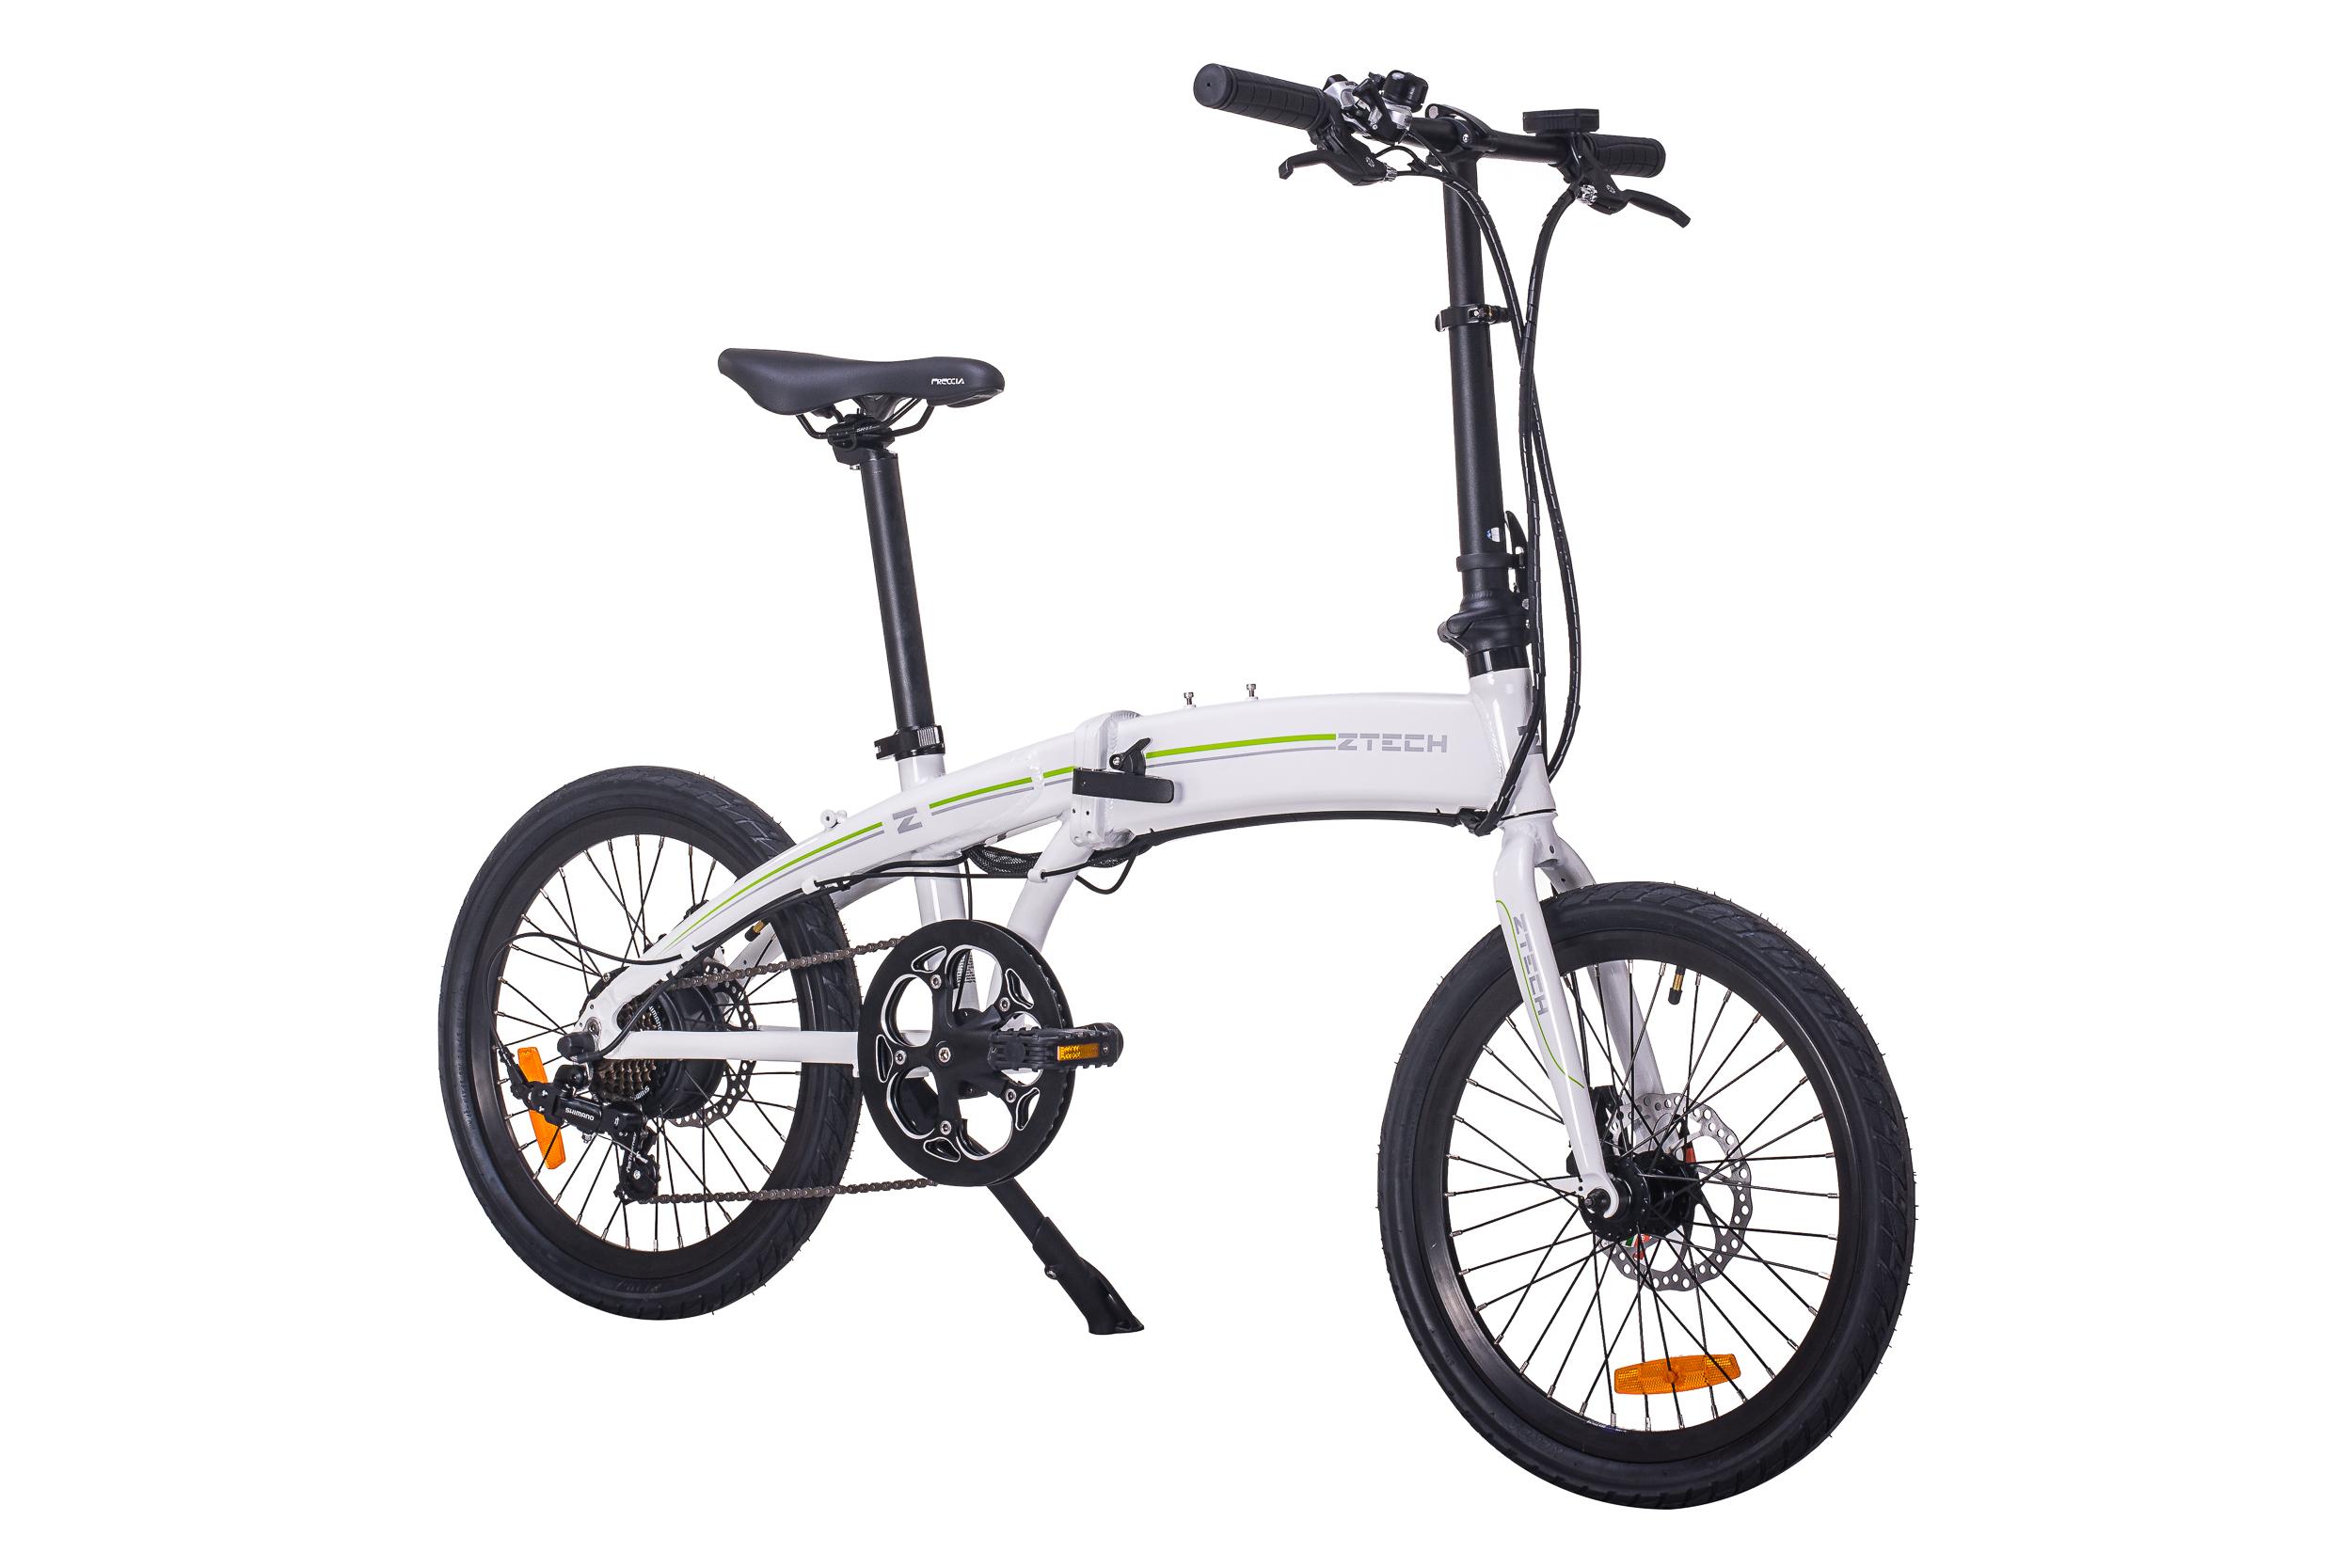 Bicicleta electrica pliabila Ztech ZT-74 Folding Litium